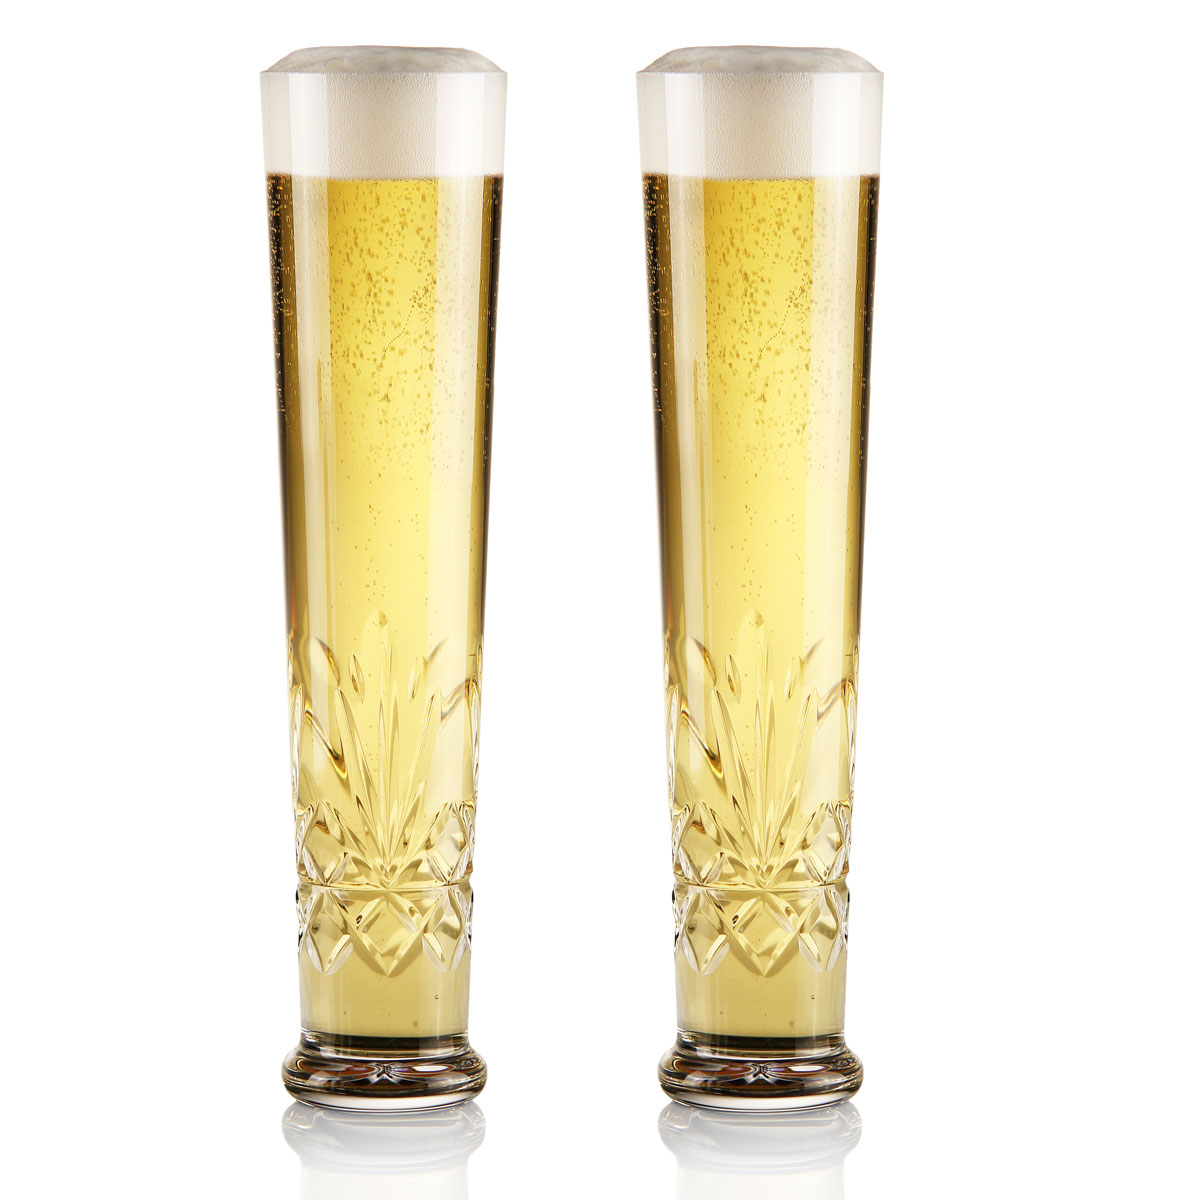 Cashs Ireland, Annestown Lager, Pilsner Beer Glass, 1+1 Free